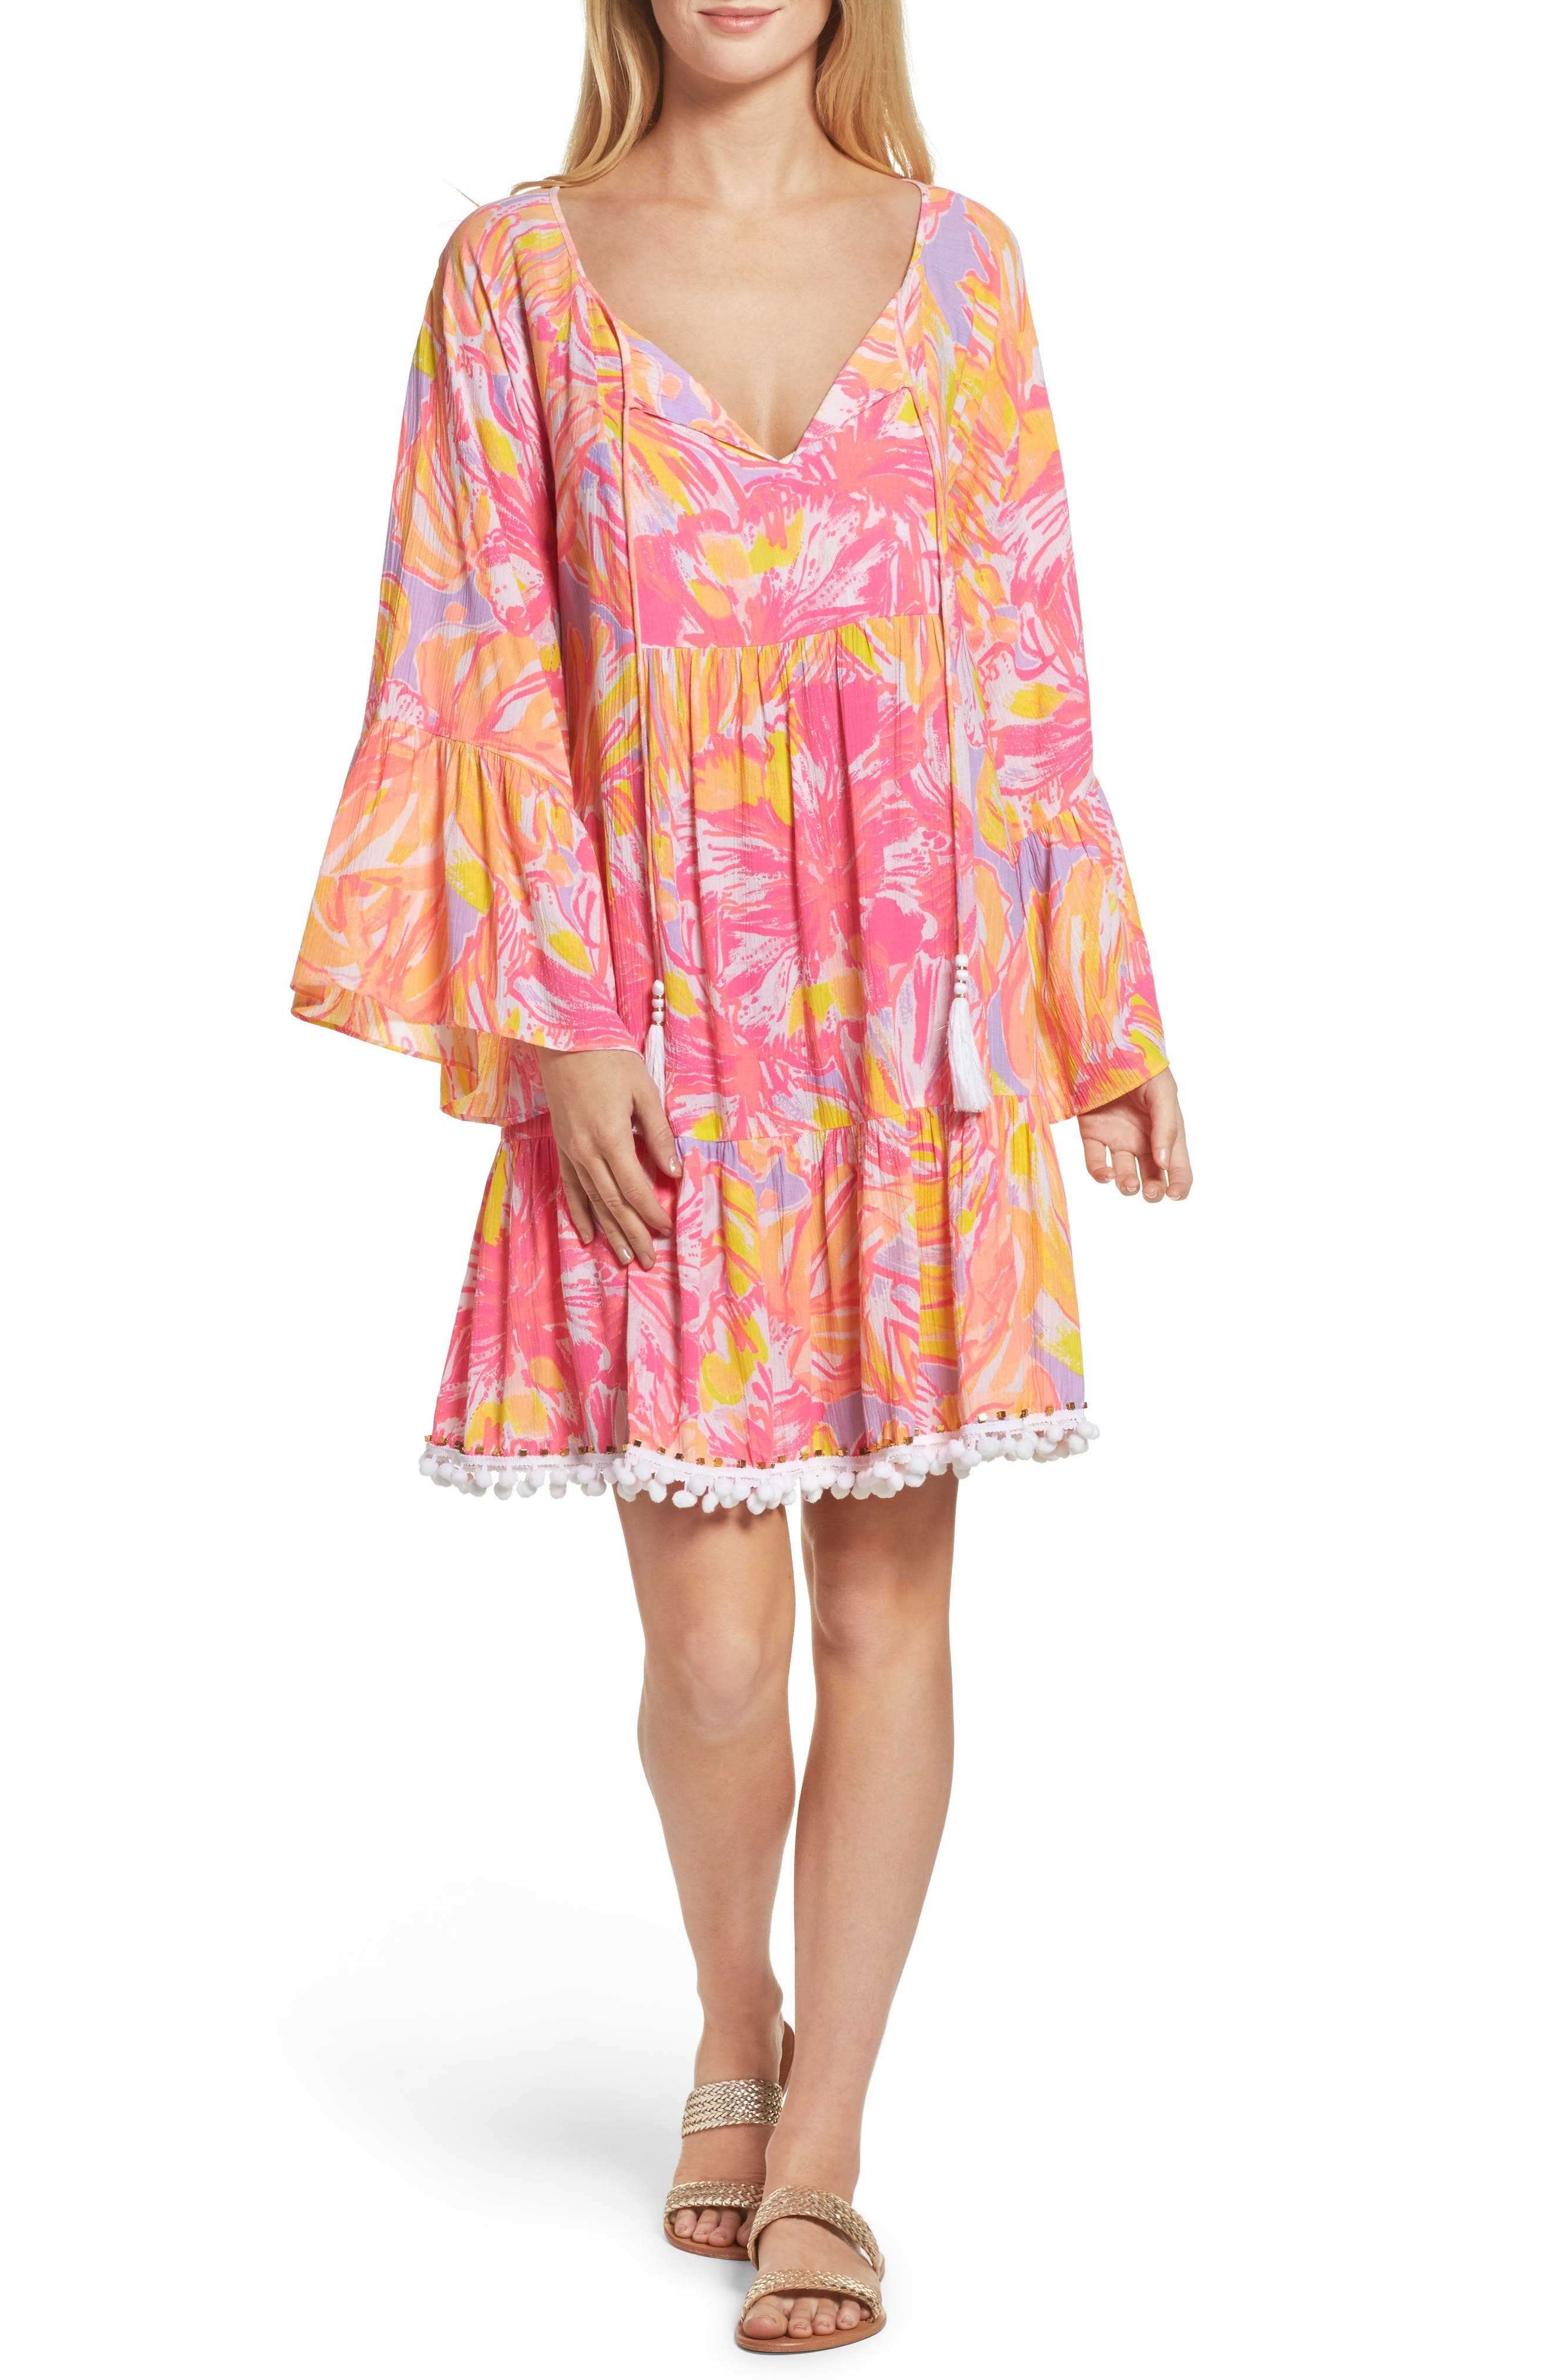 Alternate Image 1 Selected - Lilly Pulitzer® Amisa Tunic Dress